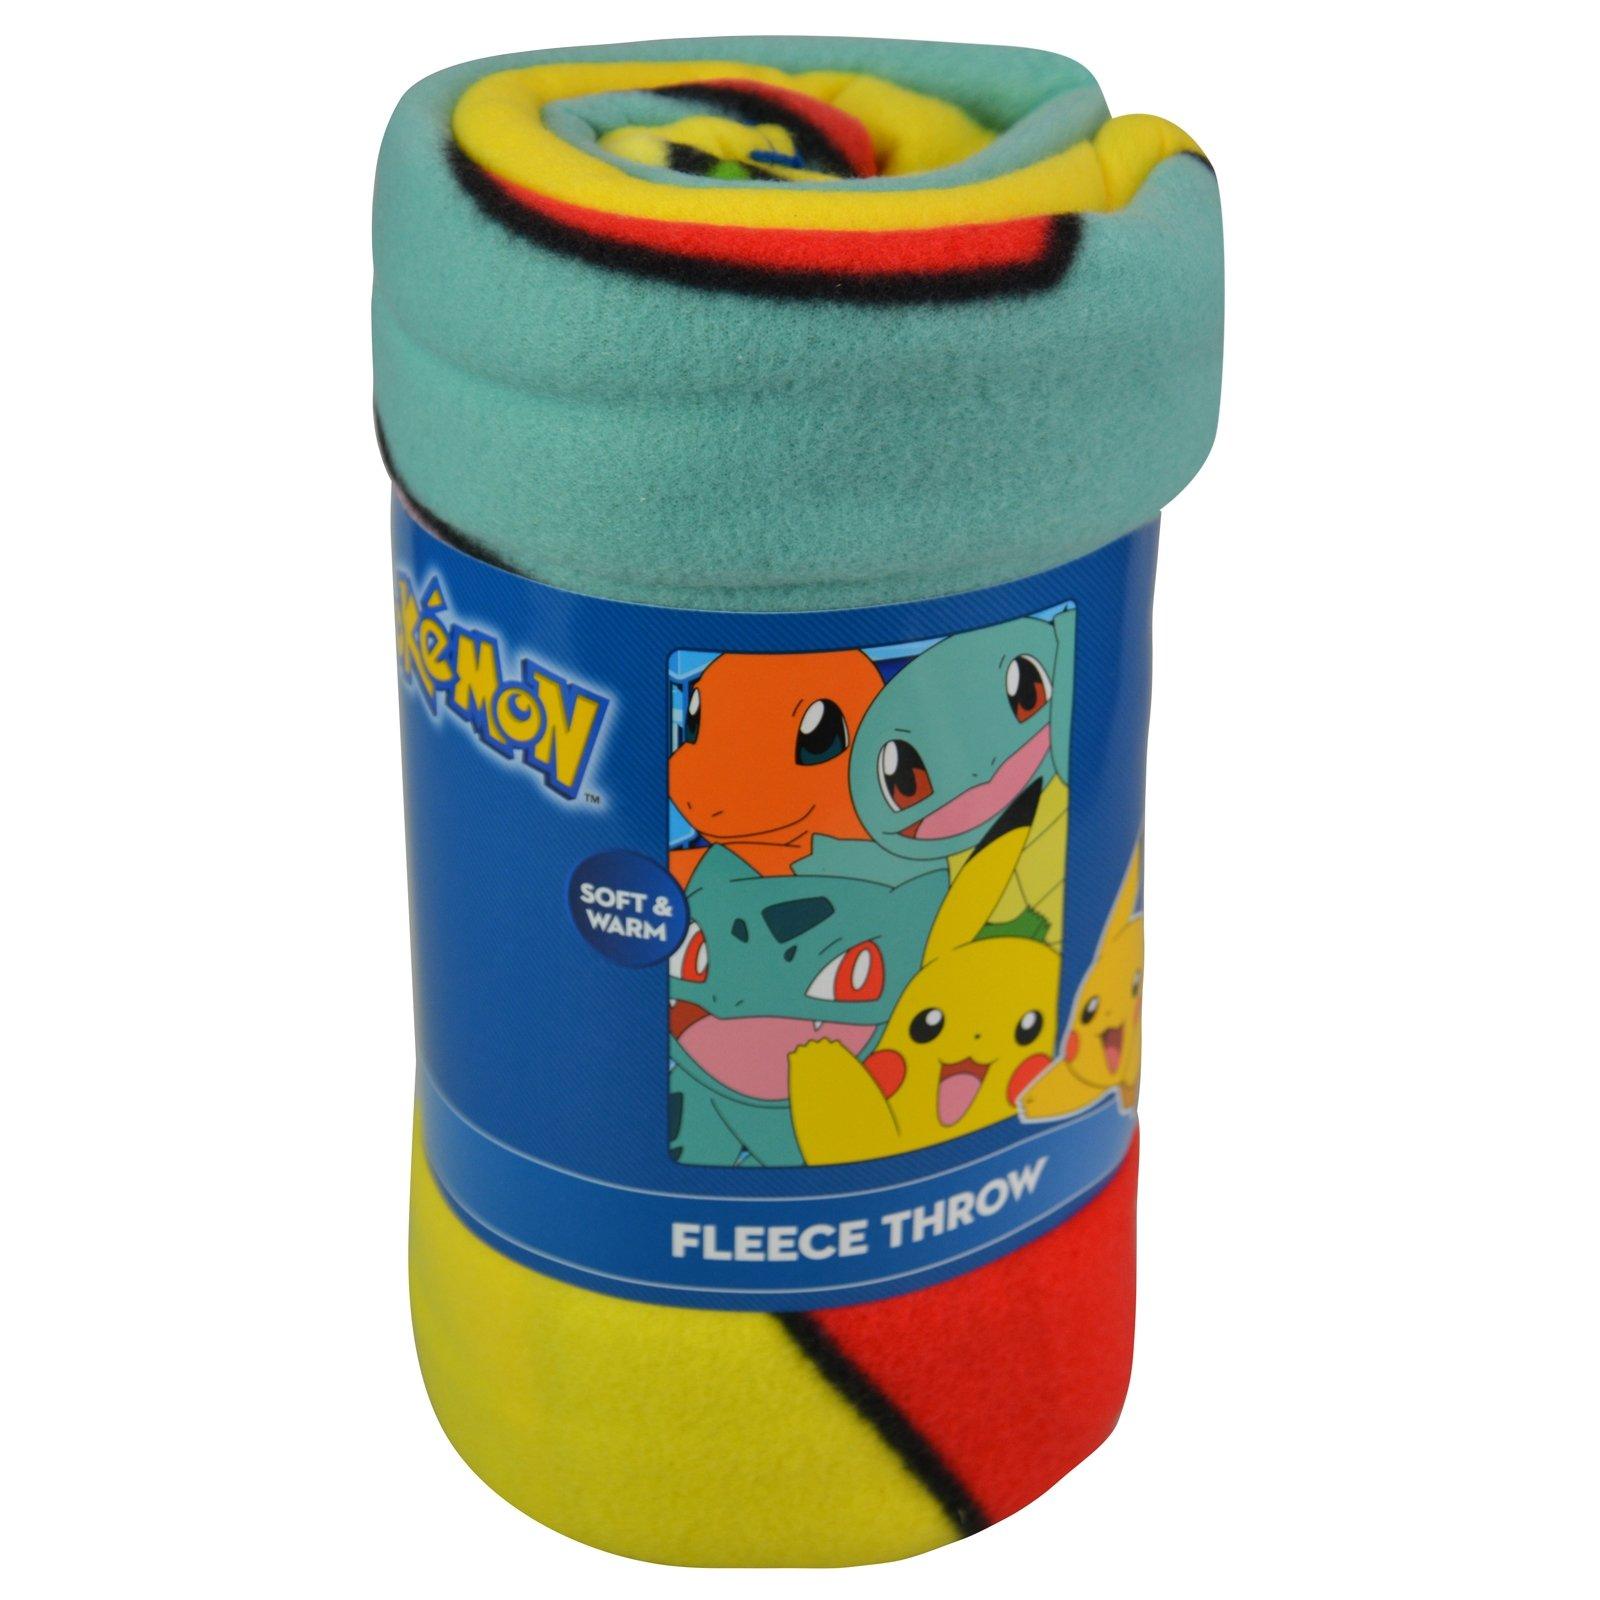 Pokemon Squirtle Charmander Bulbasaur Pikachu Kids Throw Blanket Fleece 45 x 60 inch